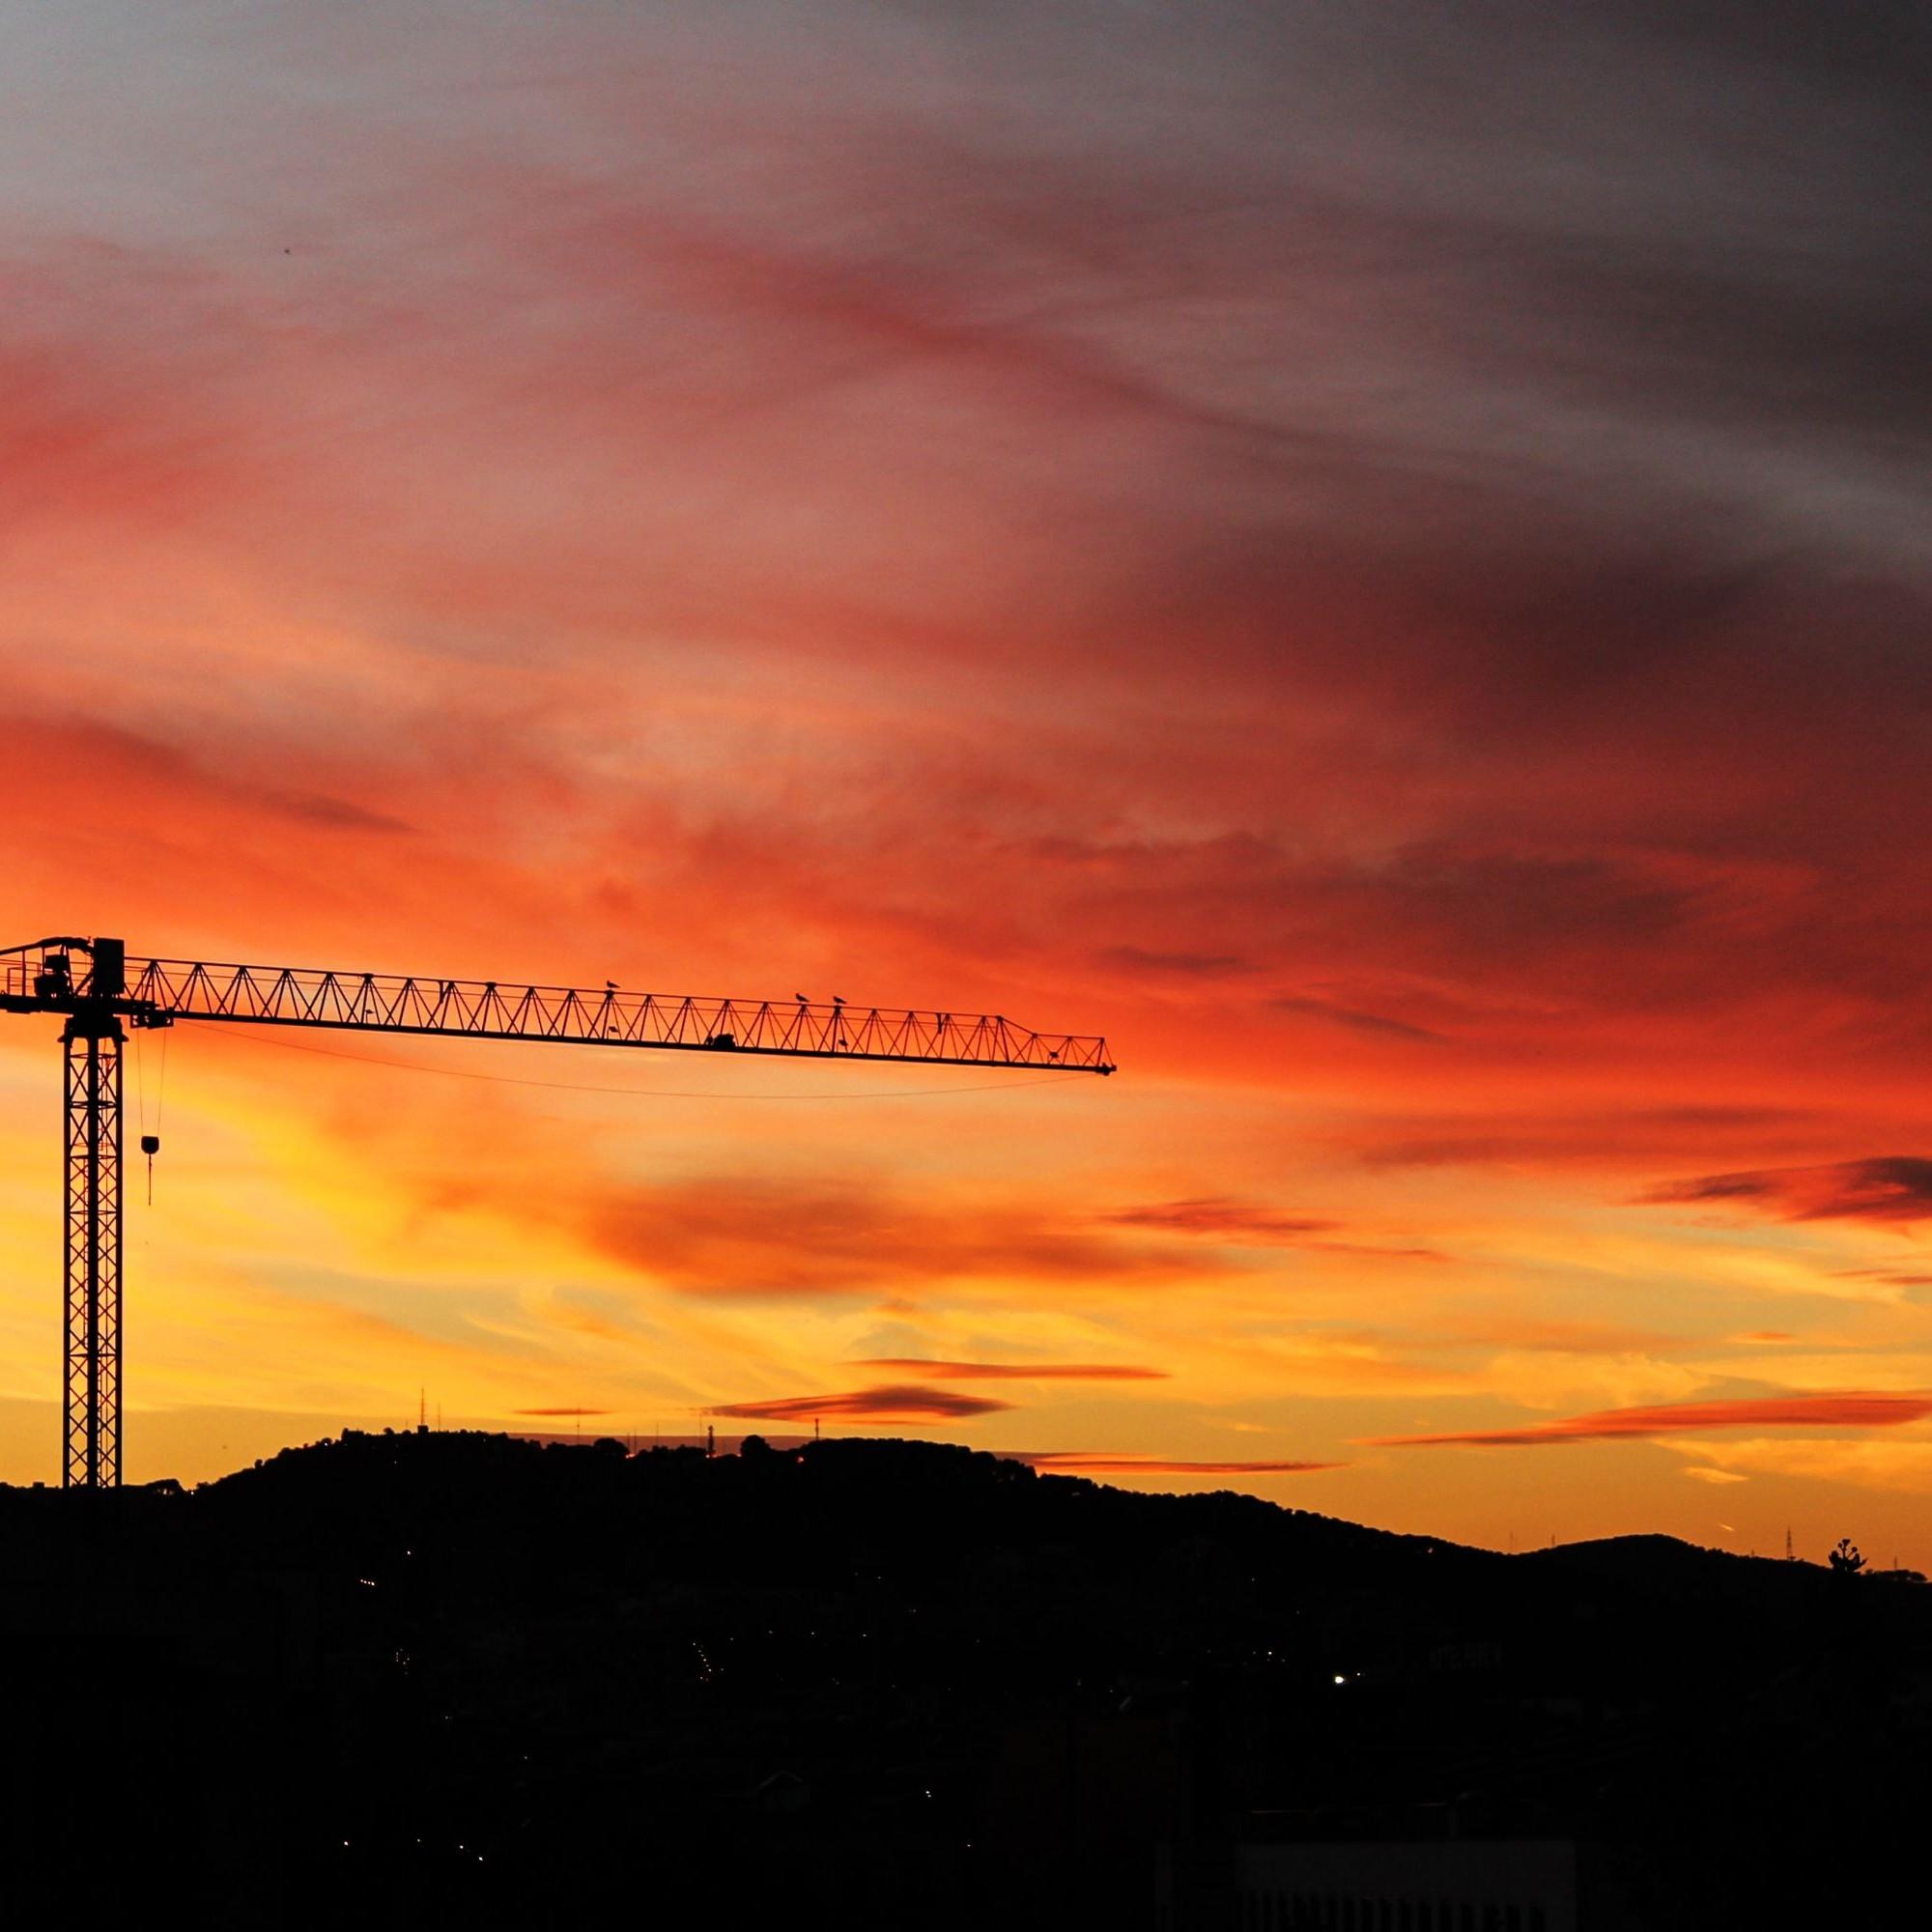 Kran bei Sonnenuntergang